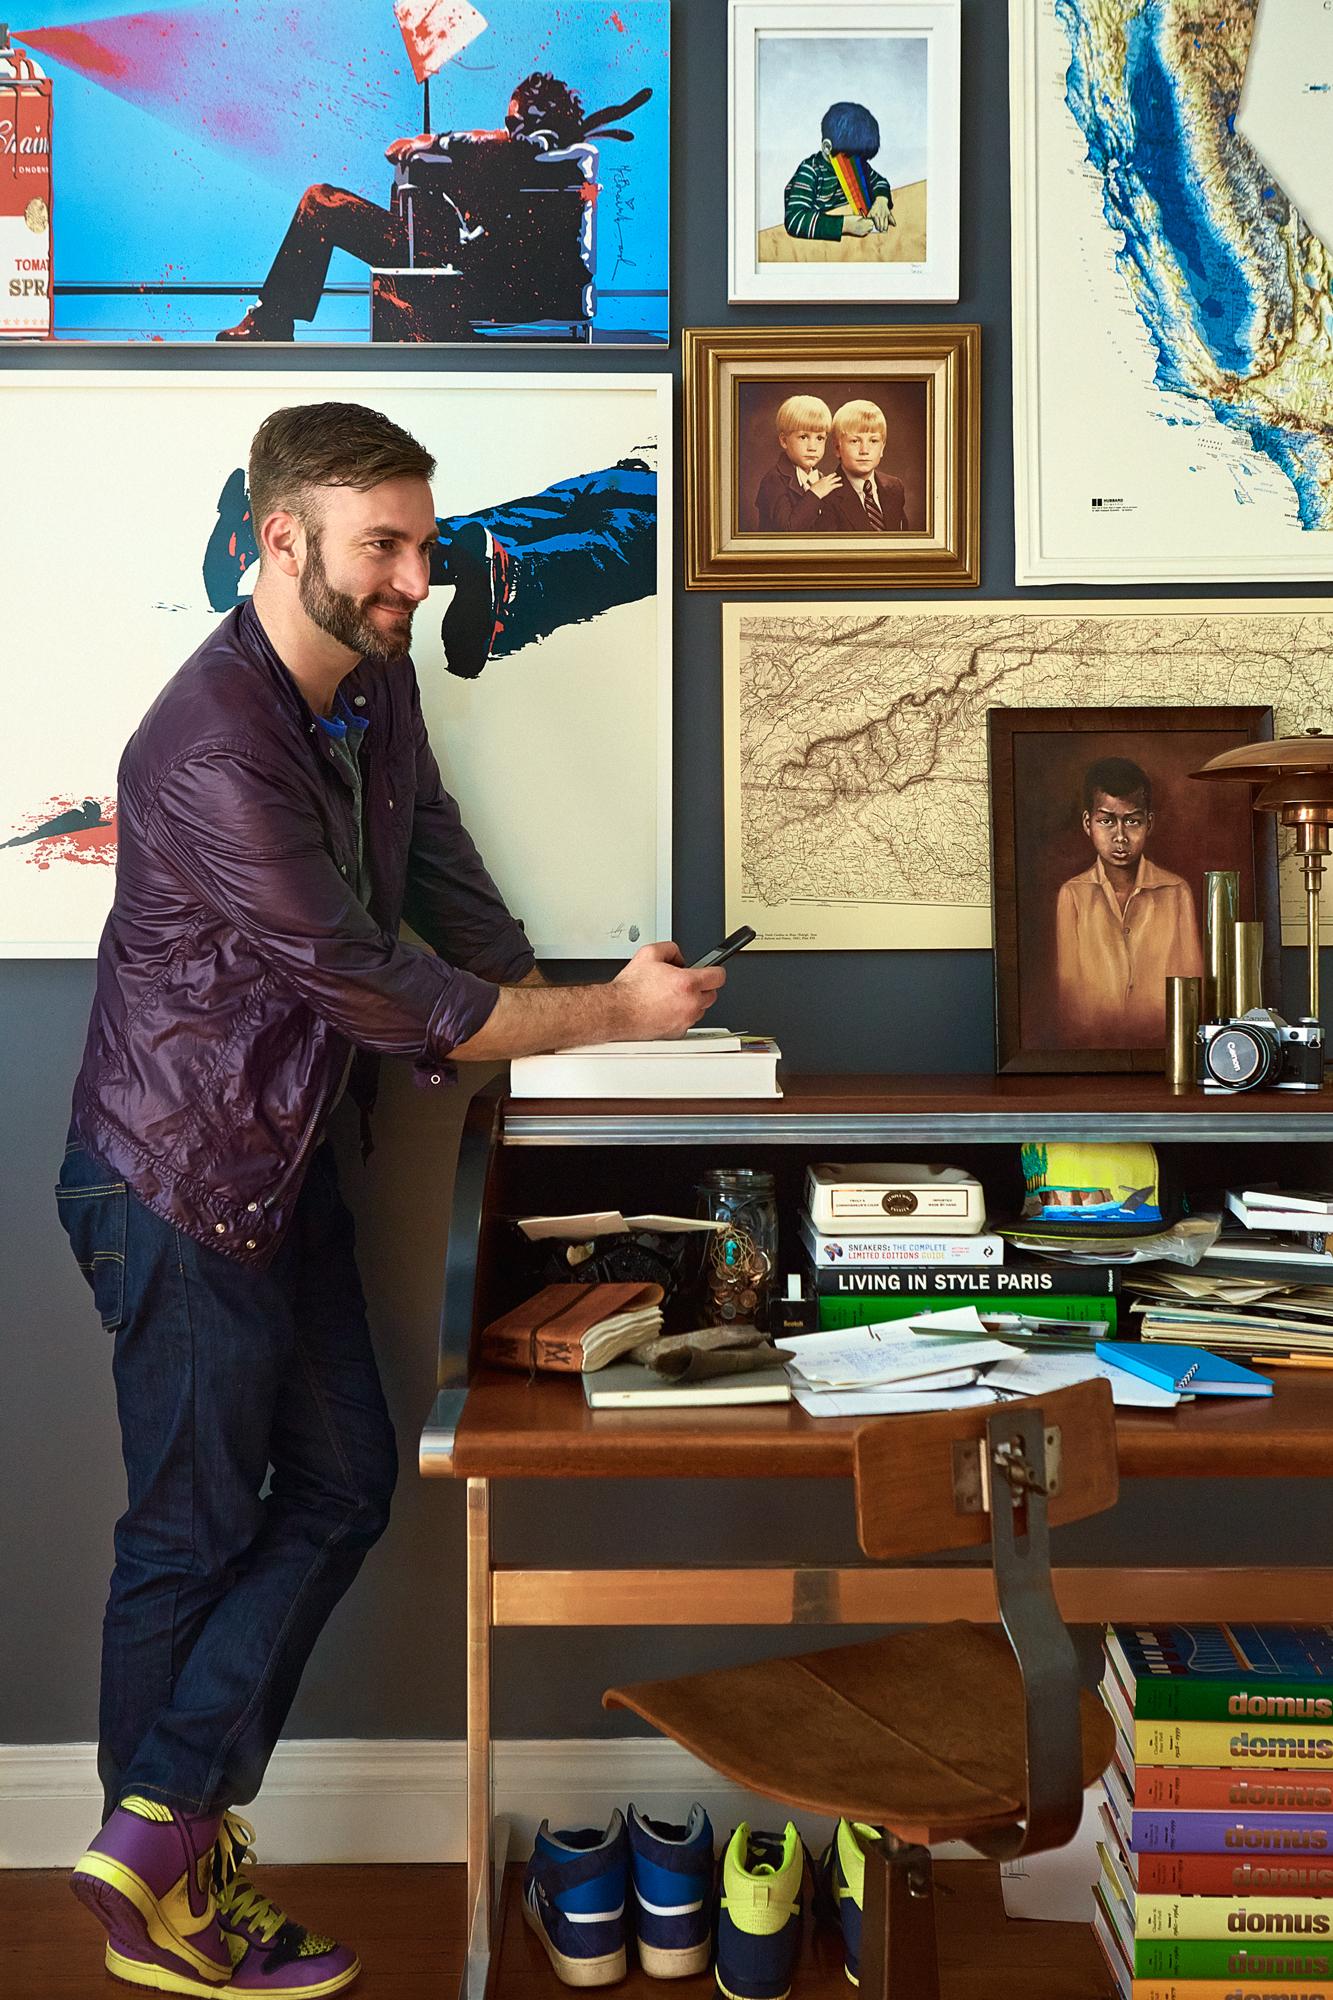 Jason-office copy.jpg